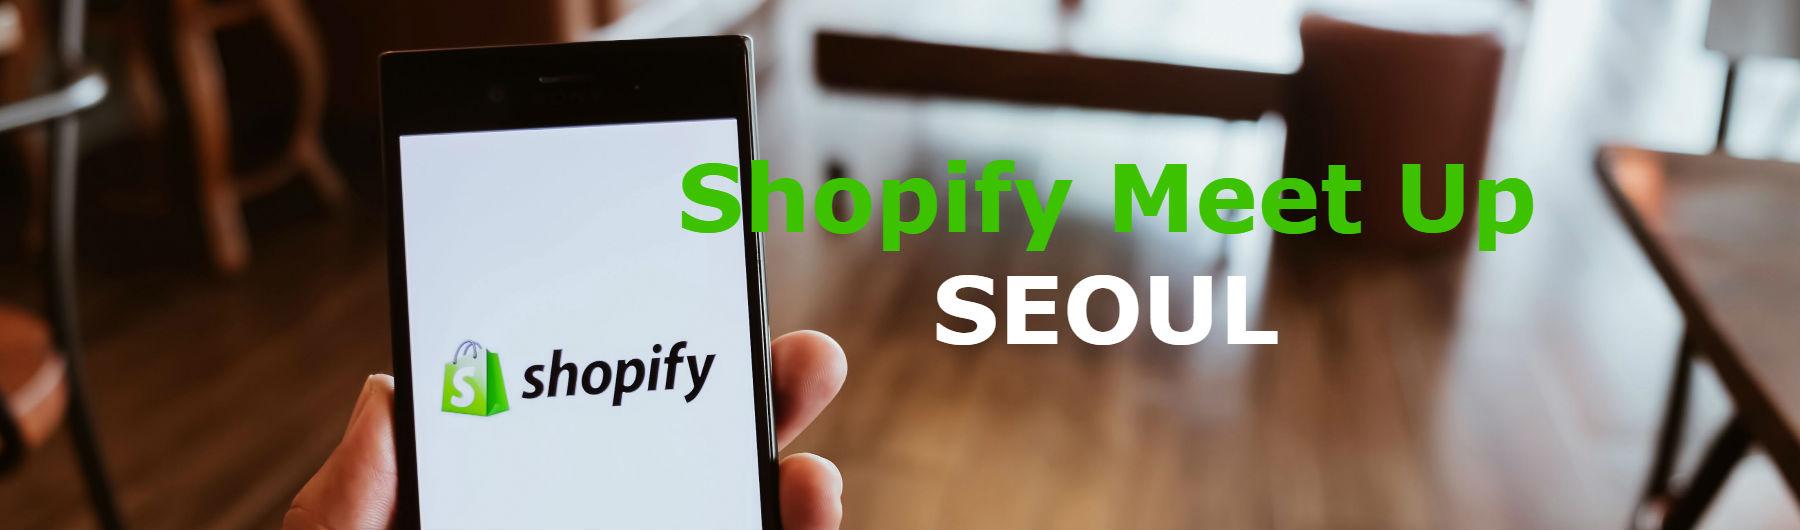 2019 Shopify Meet up SEOUL